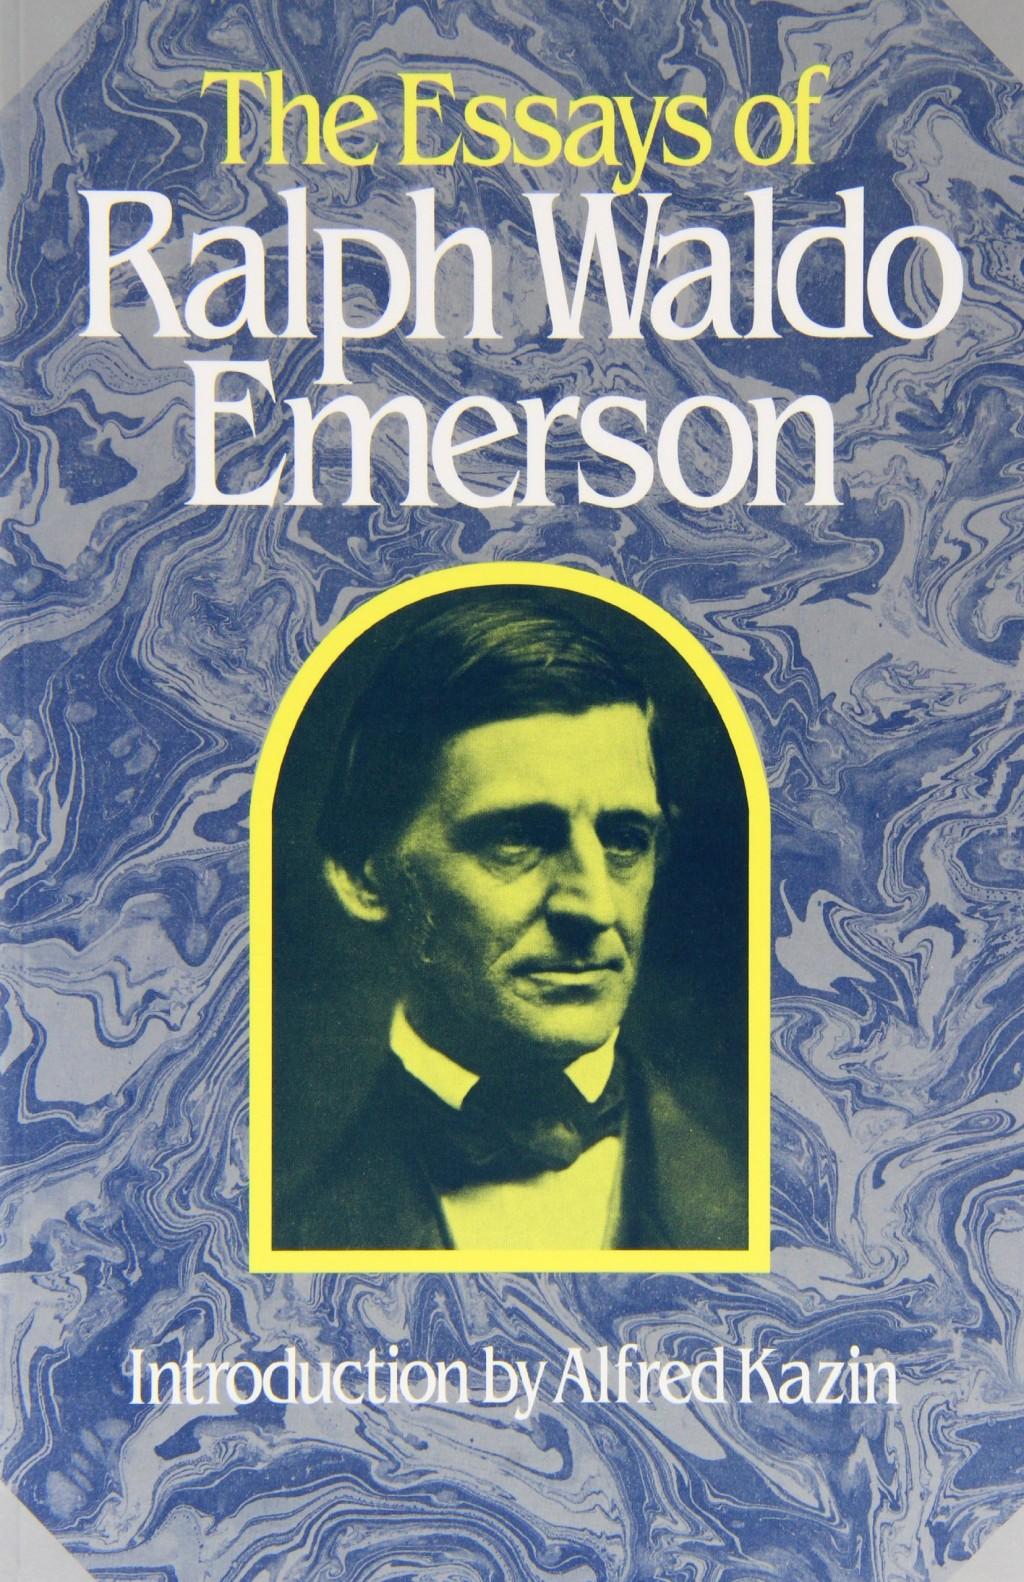 001 91blpvu4wrl Essay Example Emerson Dreaded Essays Ralph Pdf First Series Summary Waldo Nature Large